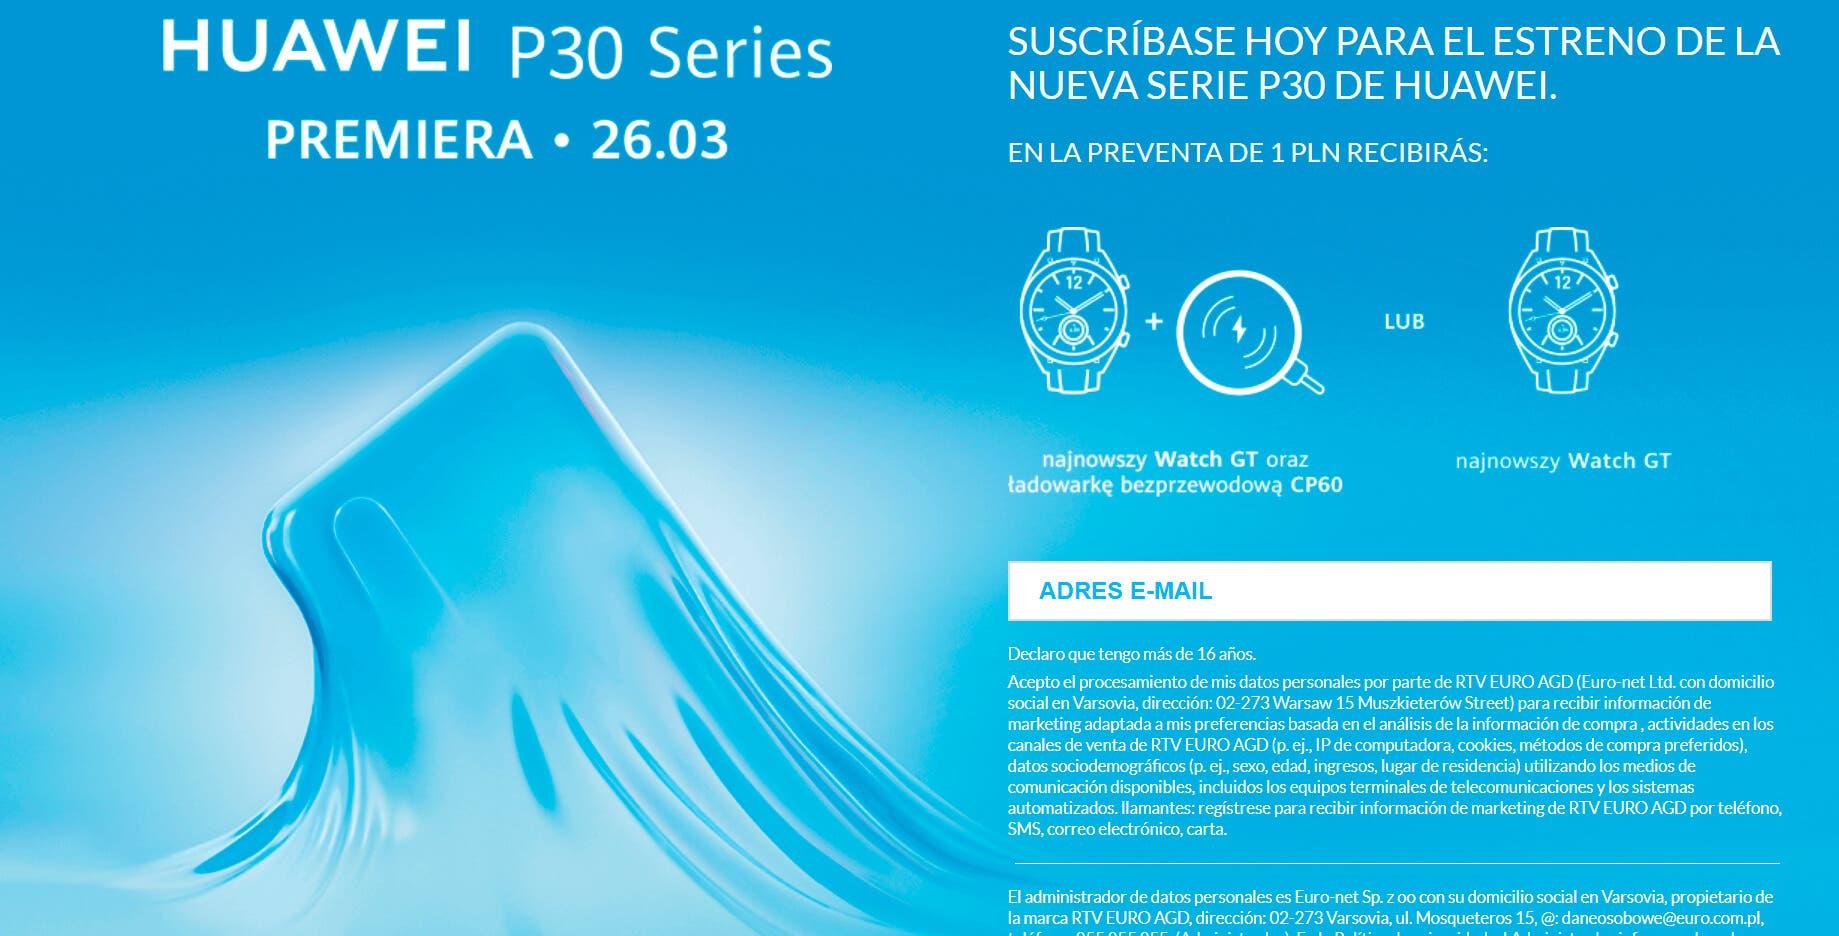 Huawei P30 reserva